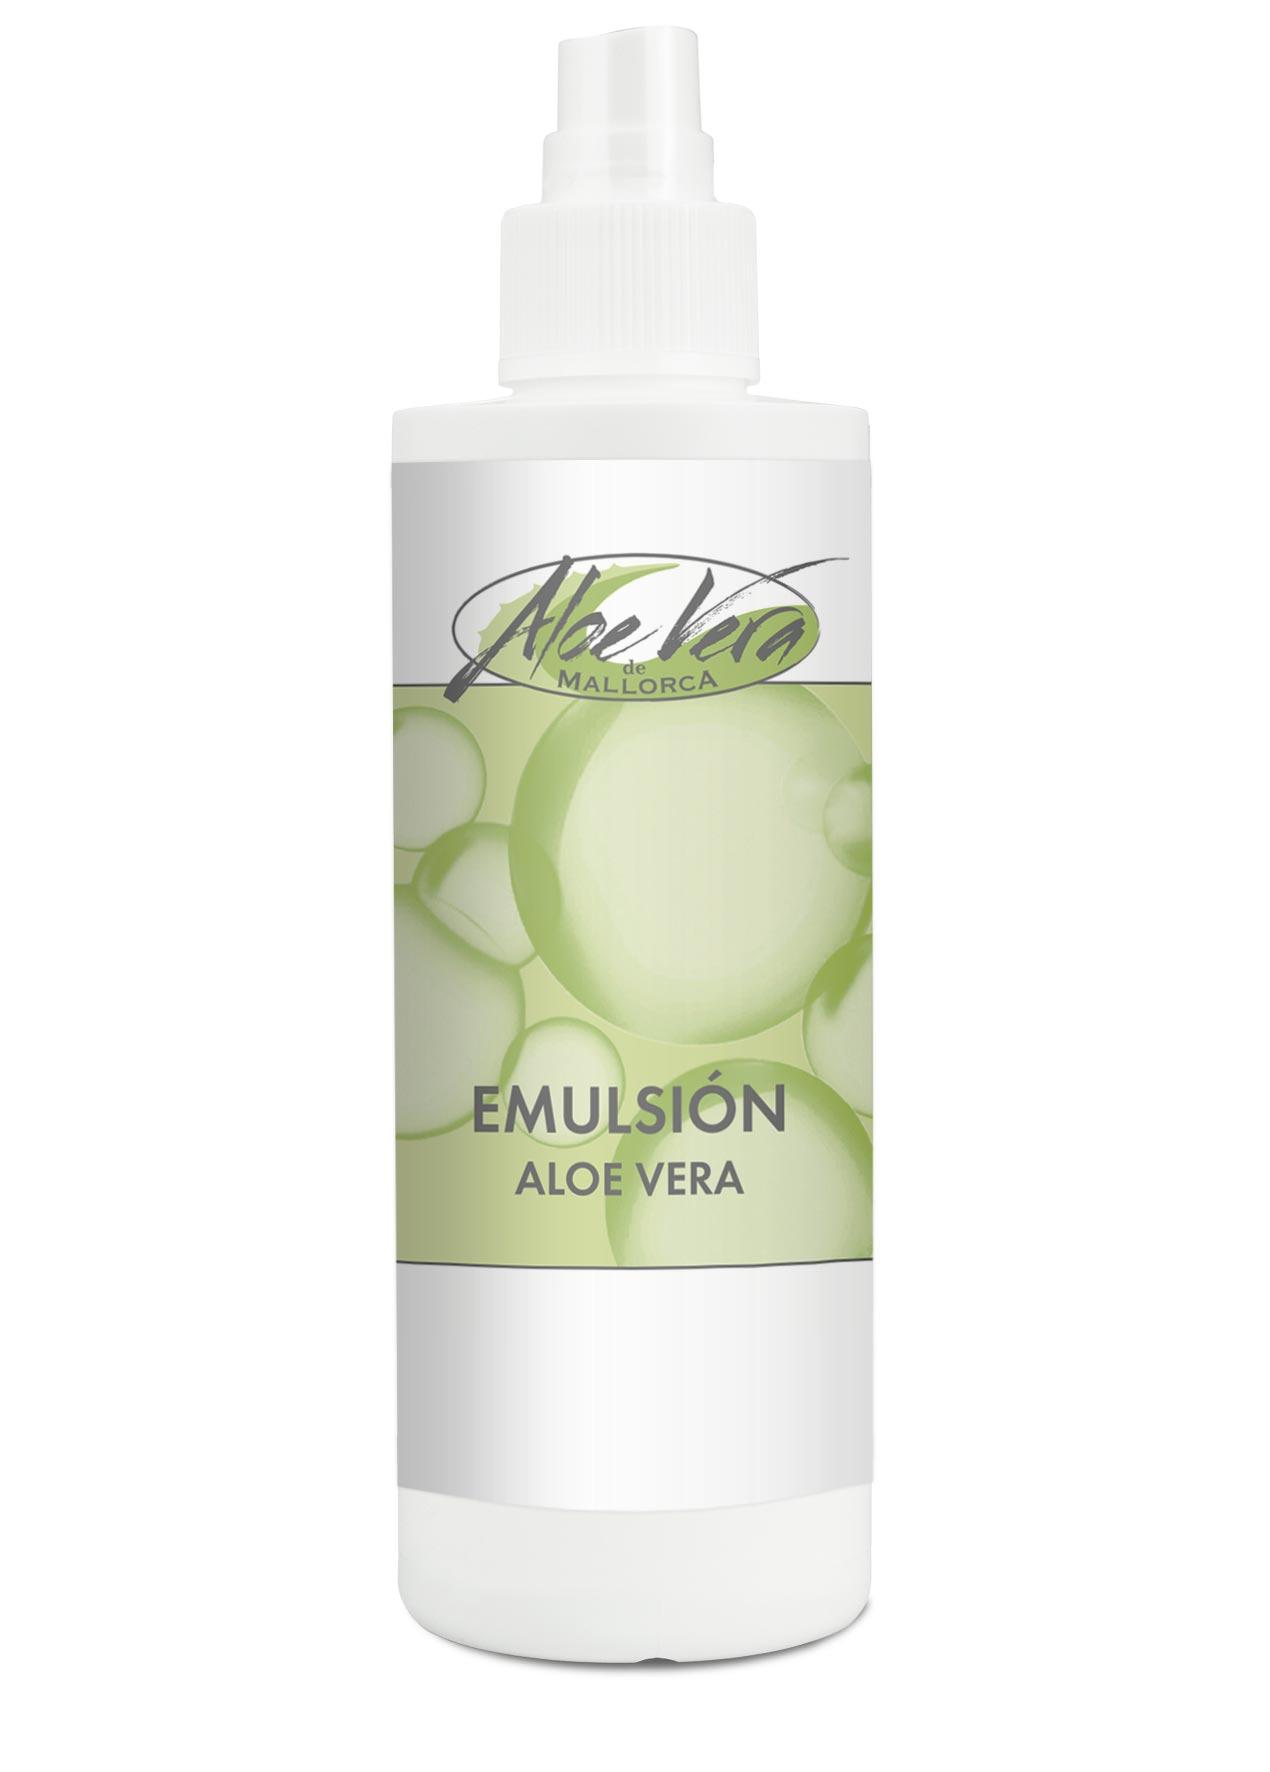 Aloe Vera Emulsion Naturkosmetik